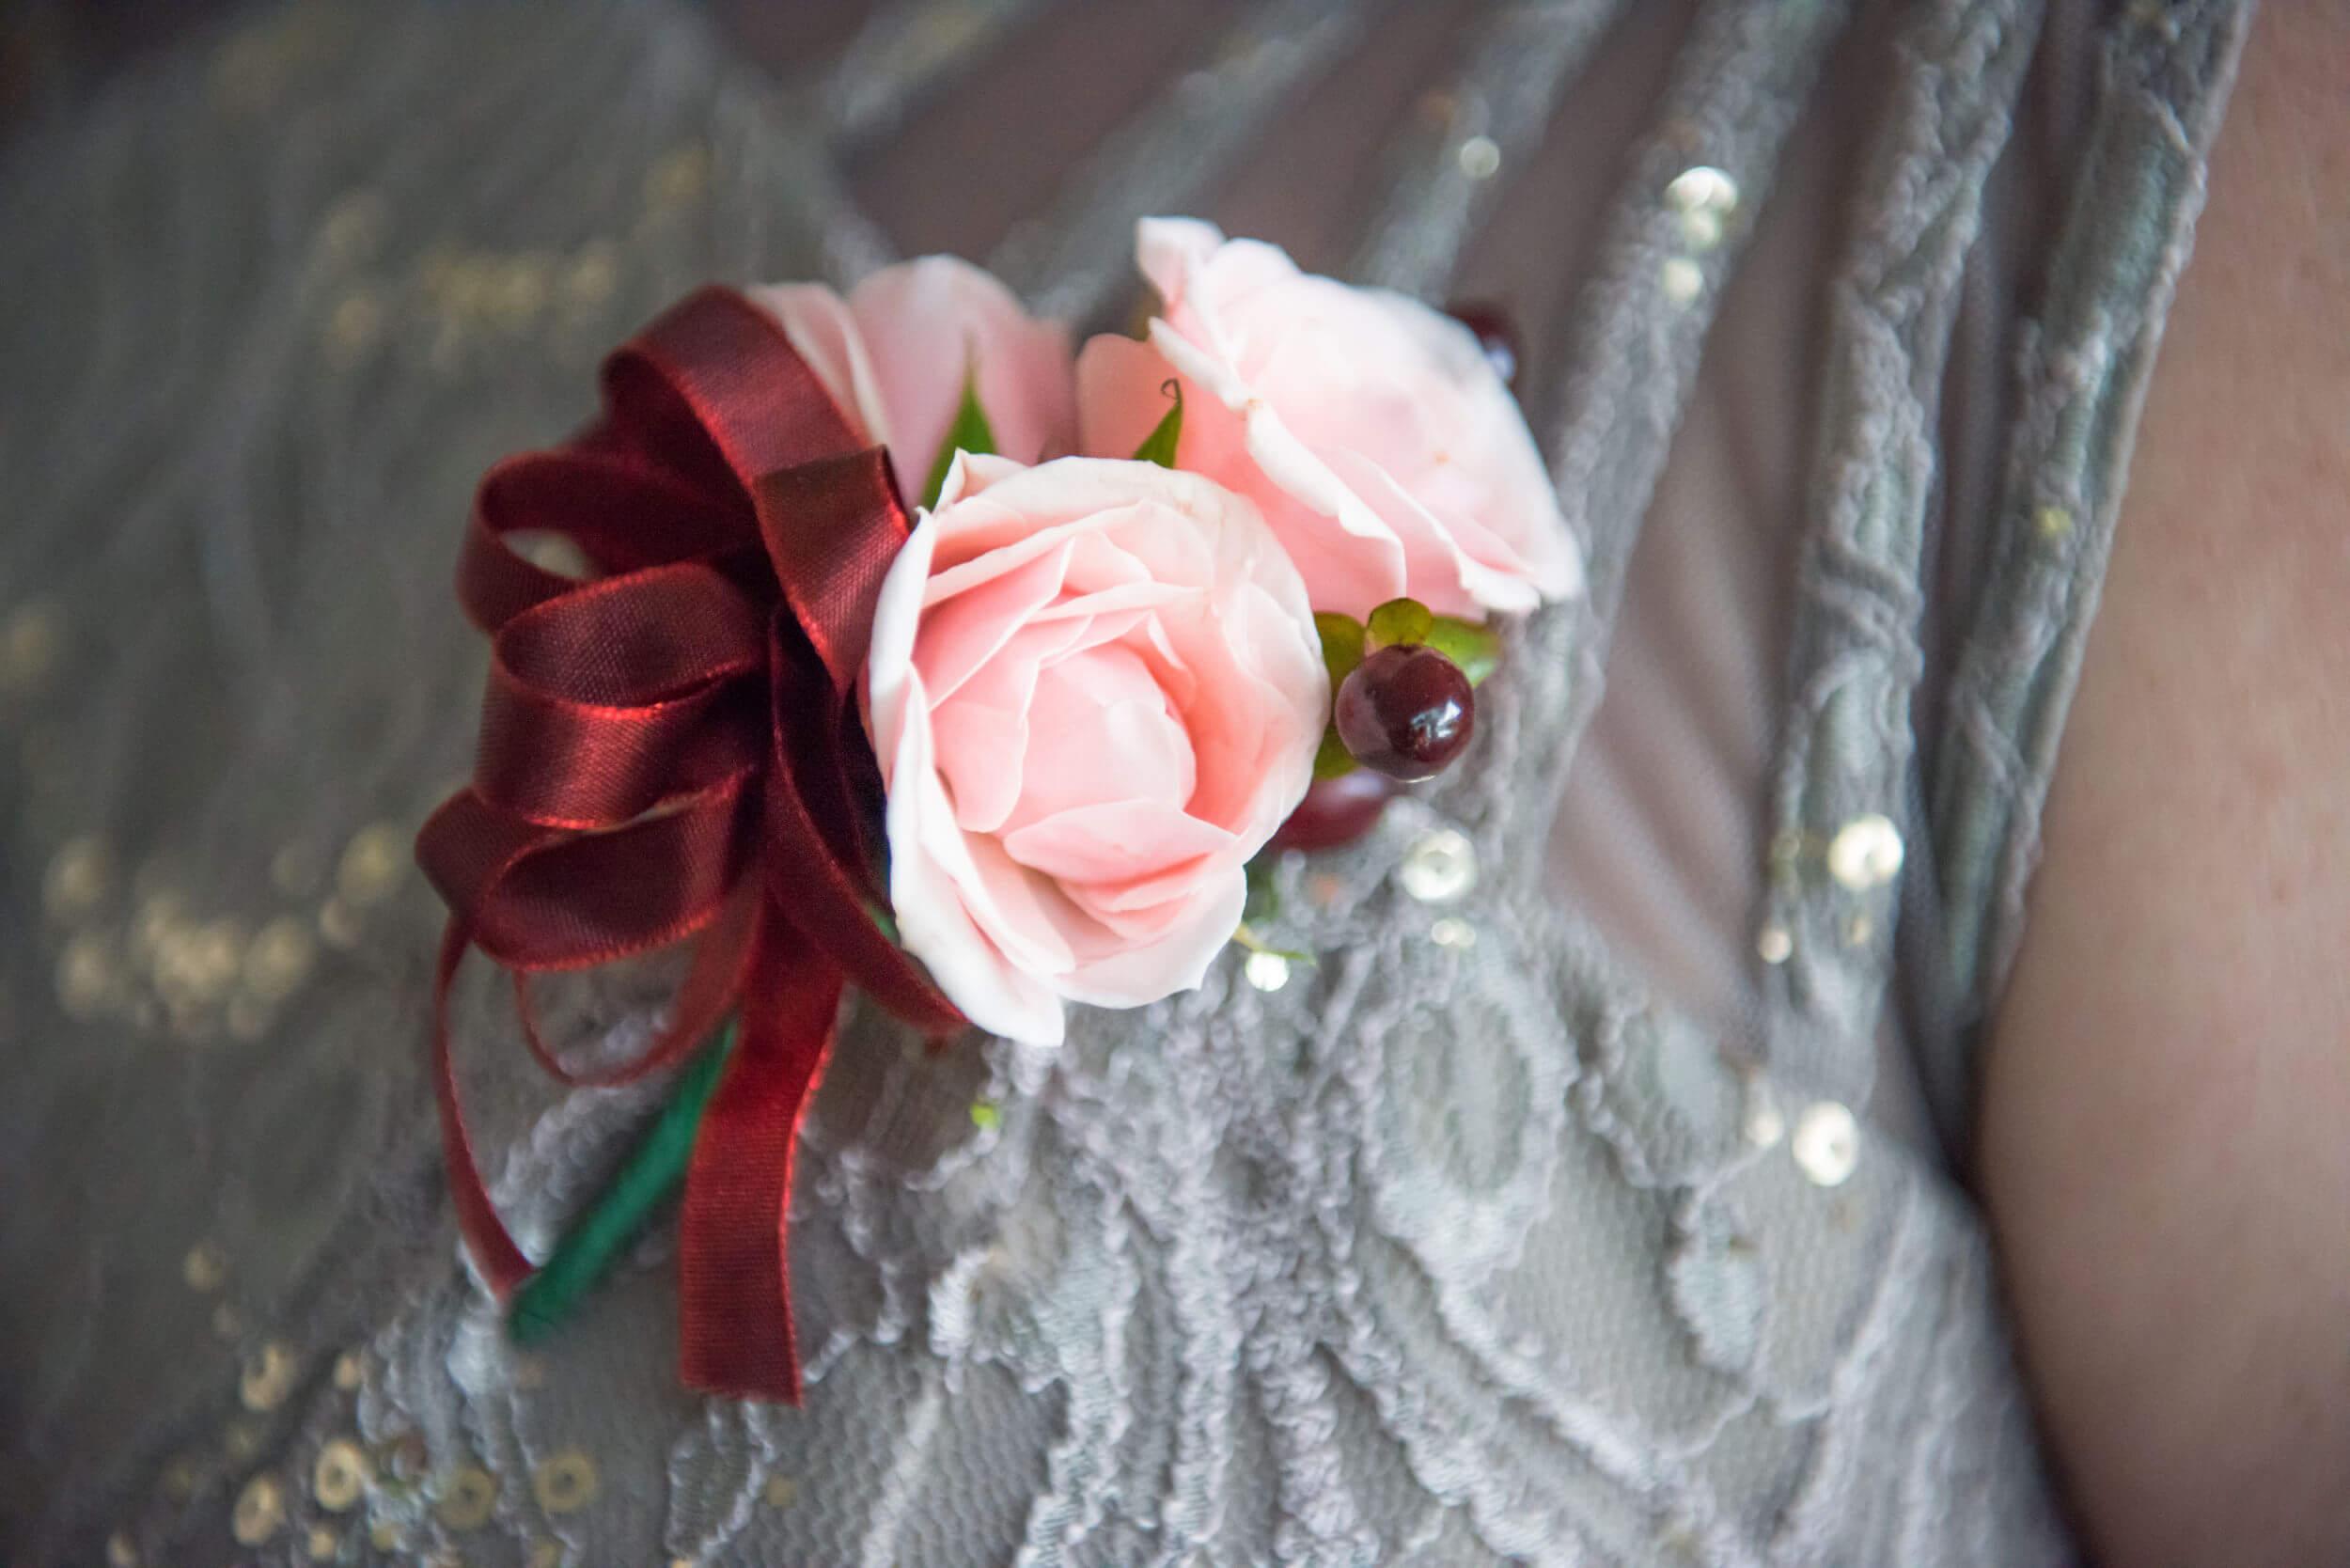 River_Rest_Weddings_Website-Pricing-Corsage.jpg